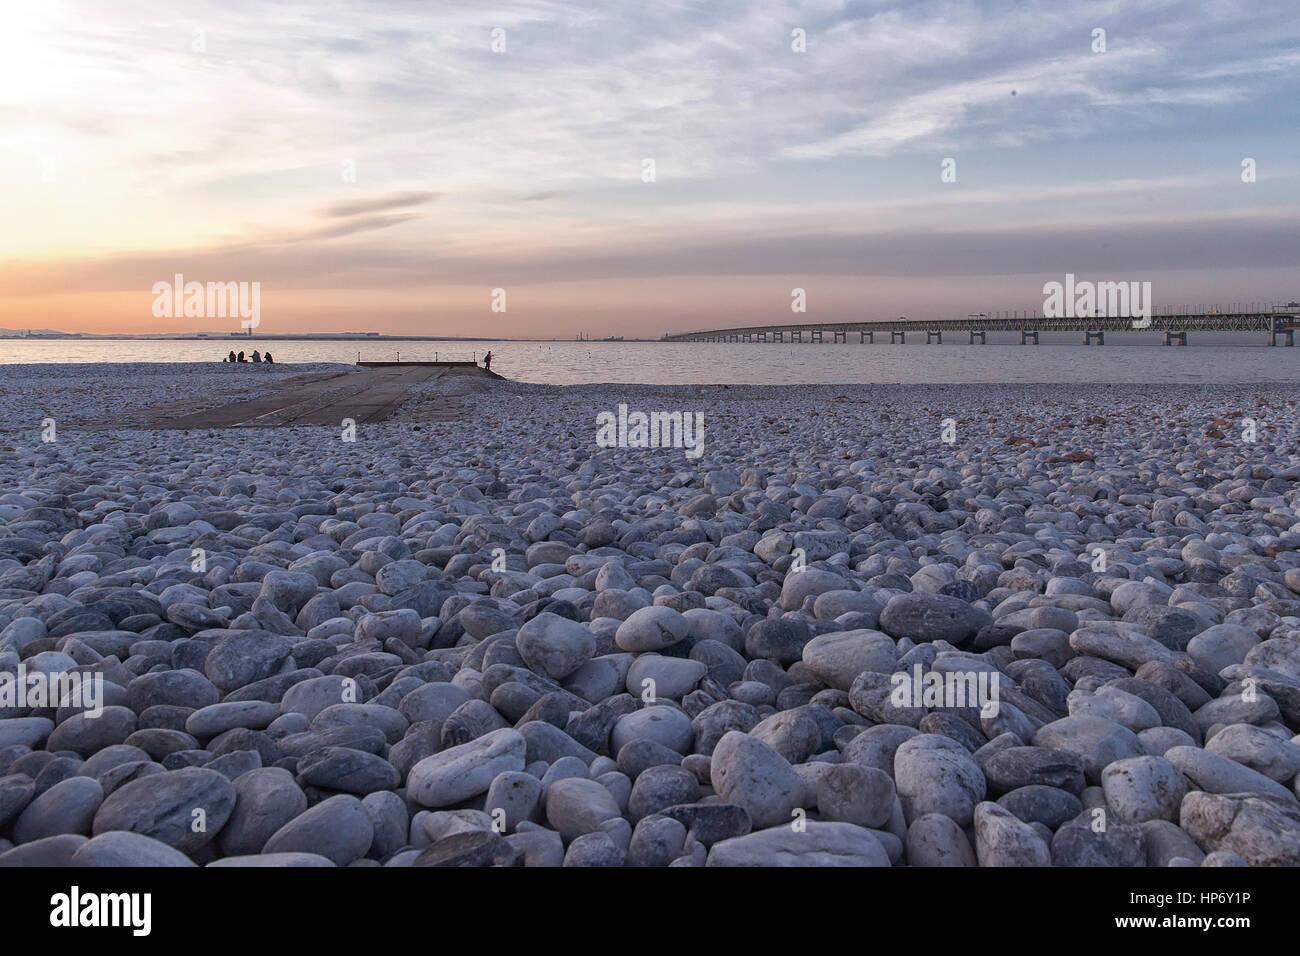 Atardecer en la playa en Osaka, Japón Imagen De Stock